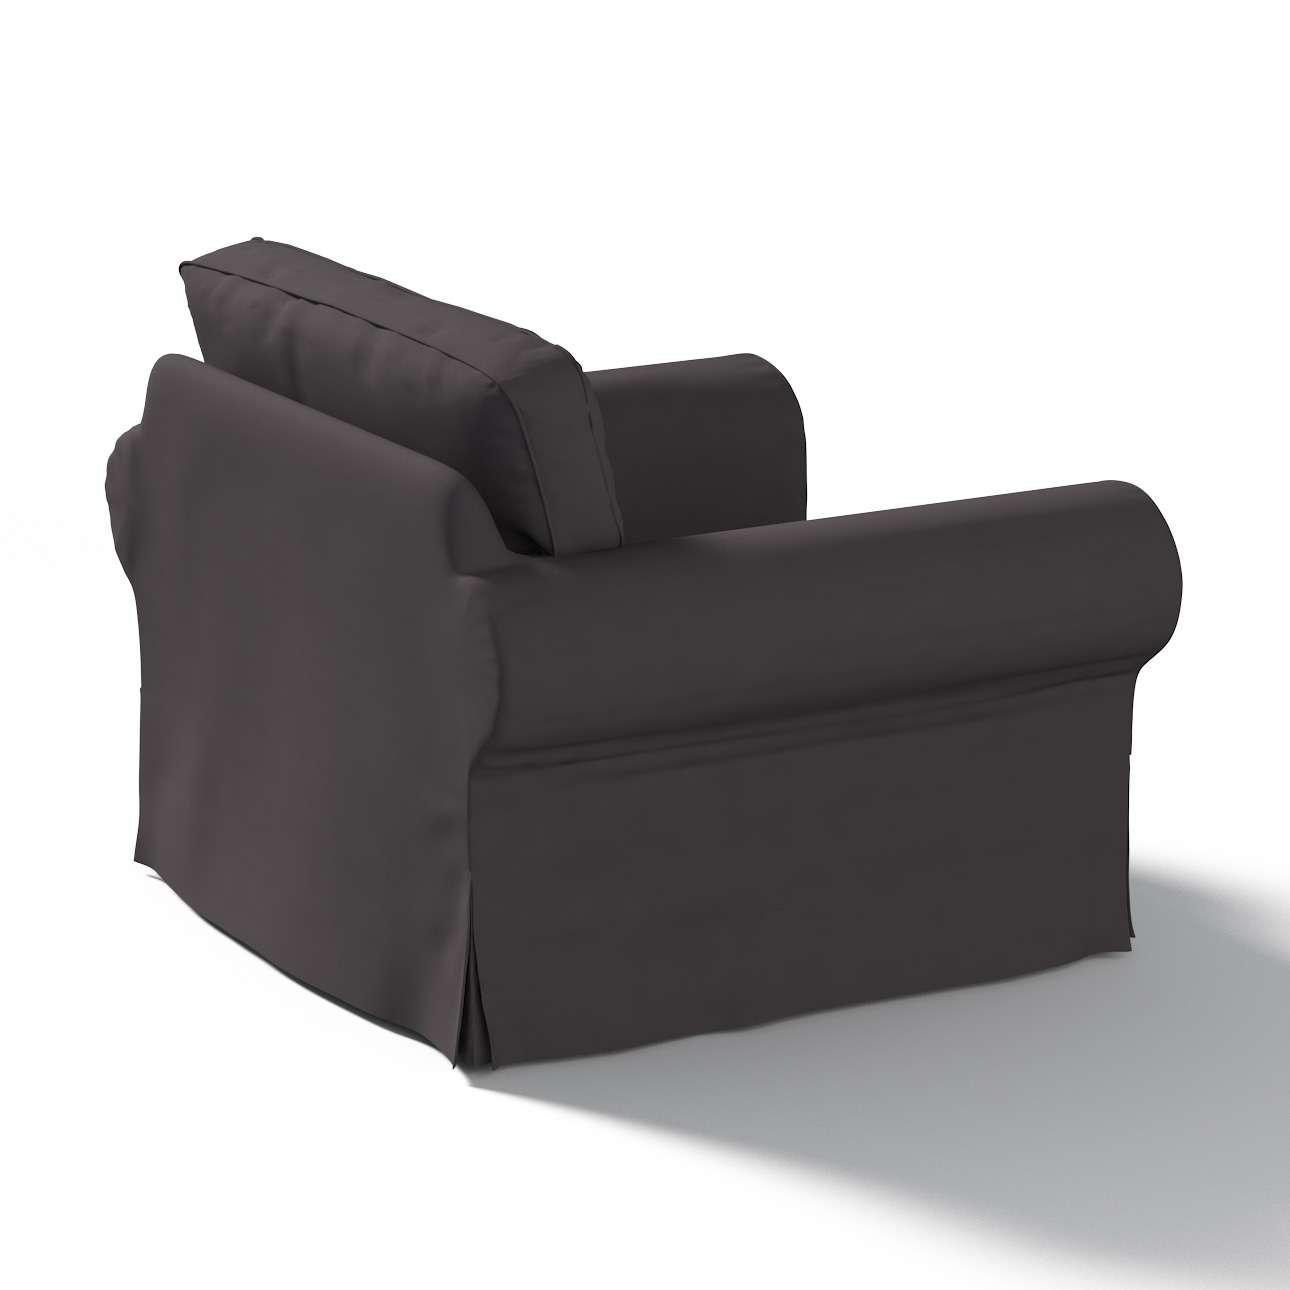 Ektorp Sesselbezug Sesselhusse, Ektorp Sessel von der Kollektion Cotton Panama, Stoff: 702-09